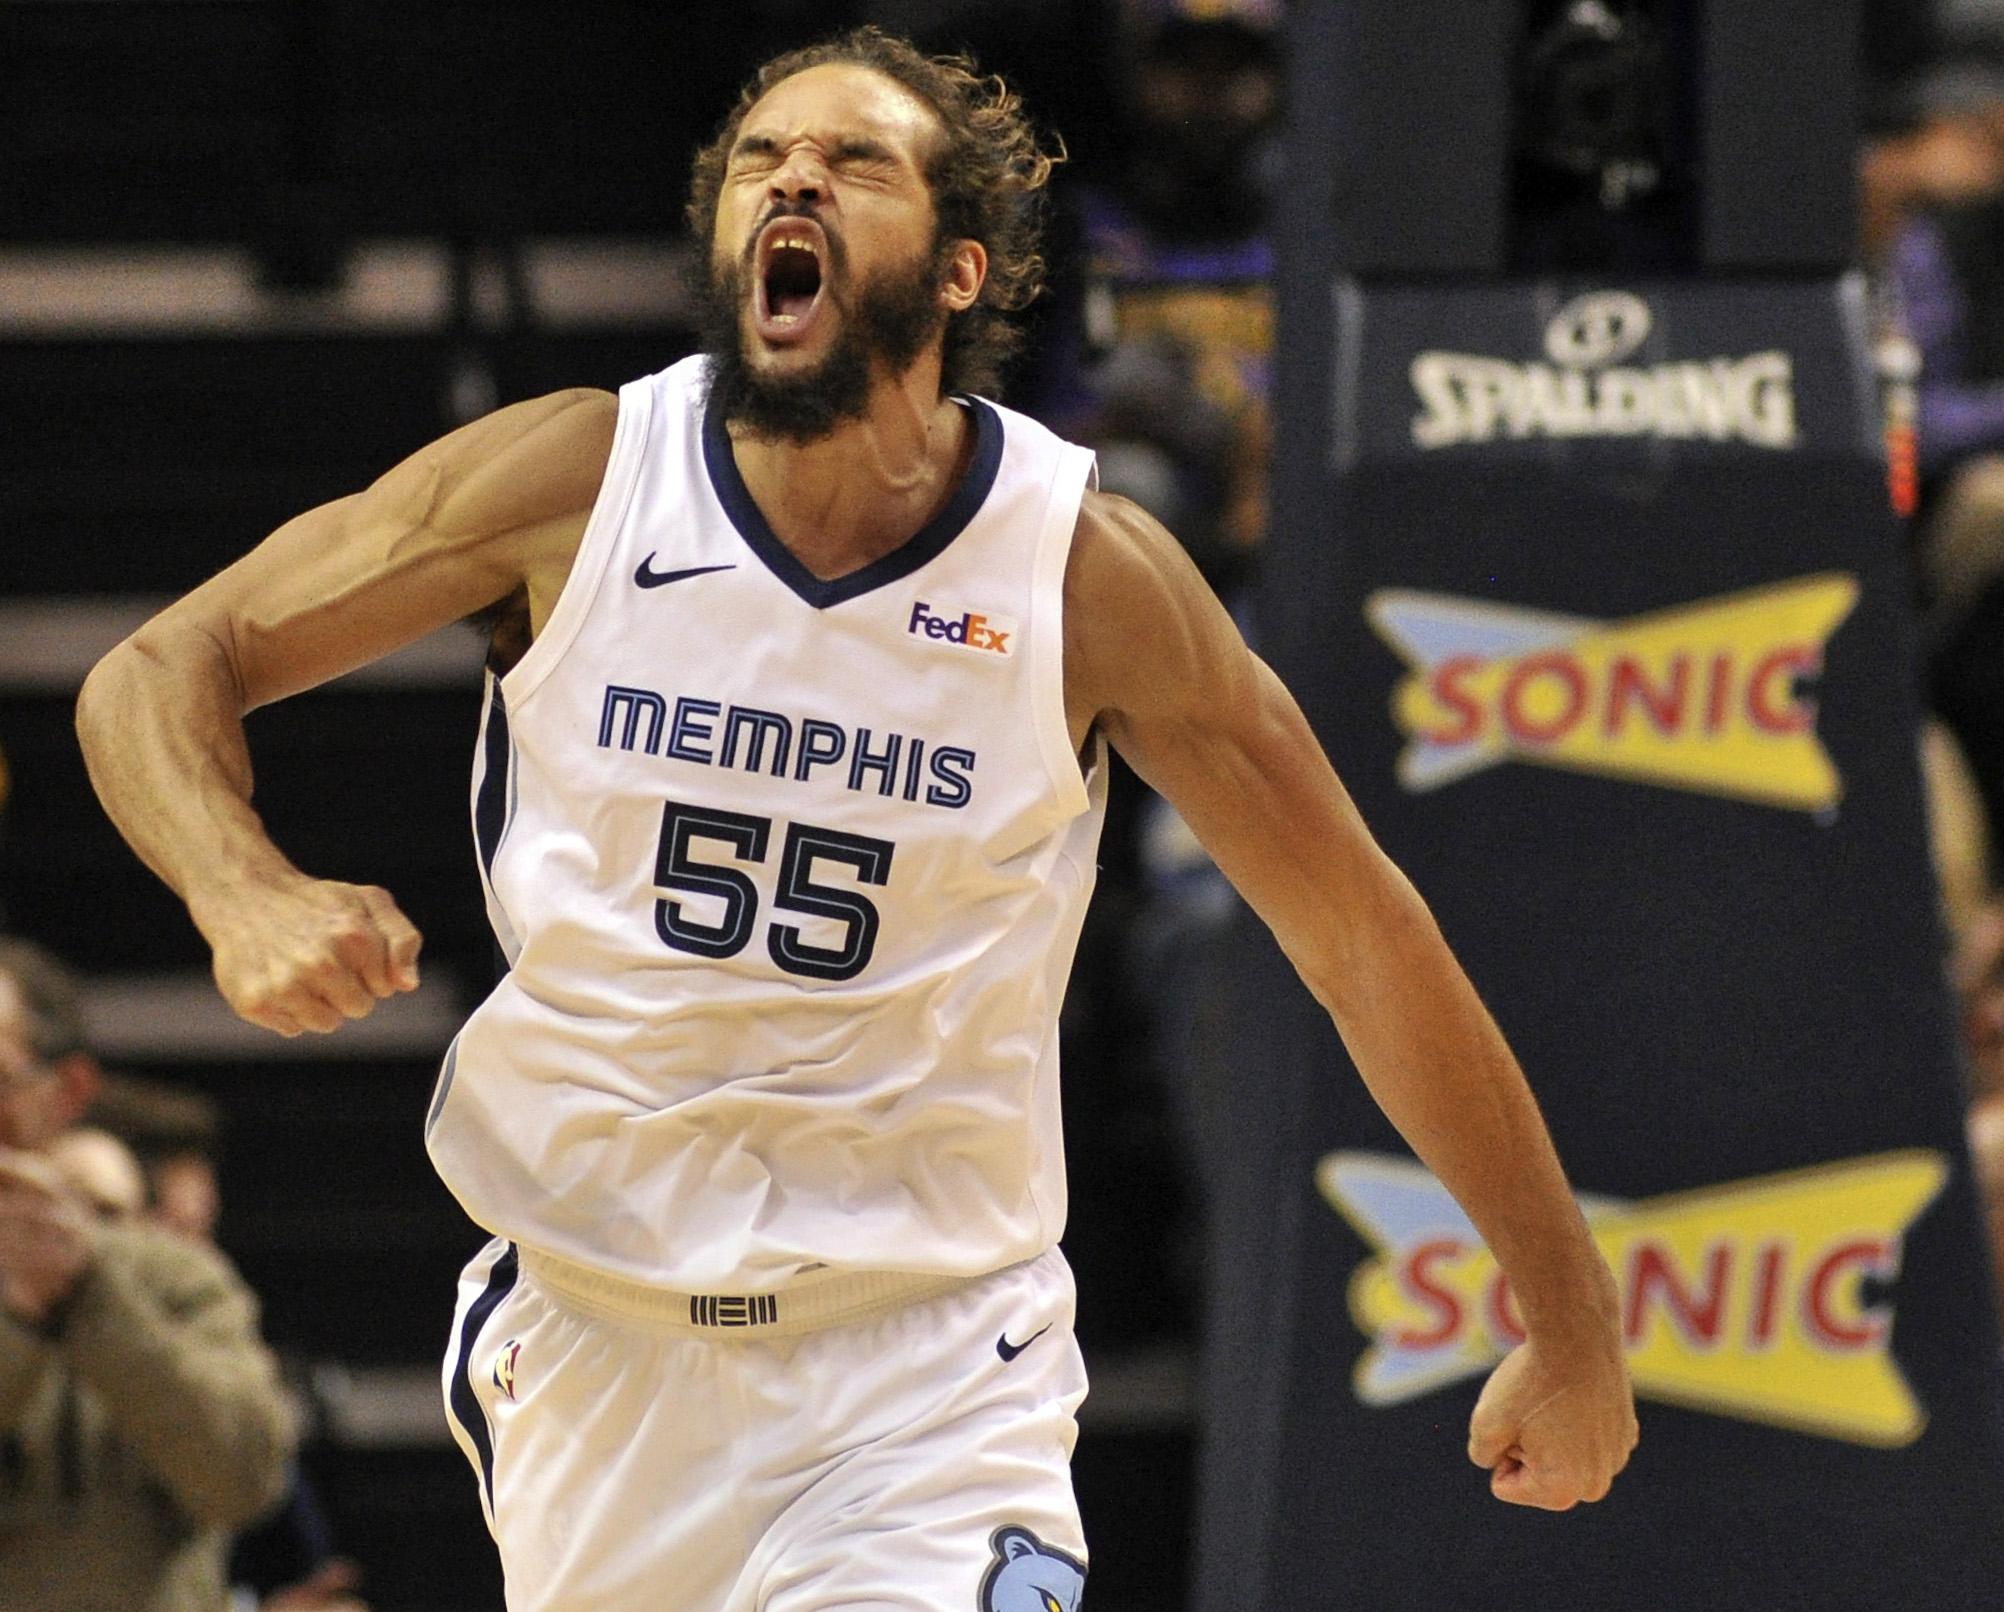 acheter en ligne 47fb2 02c97 La renaissance de Joakim Noah - NBA - Basket